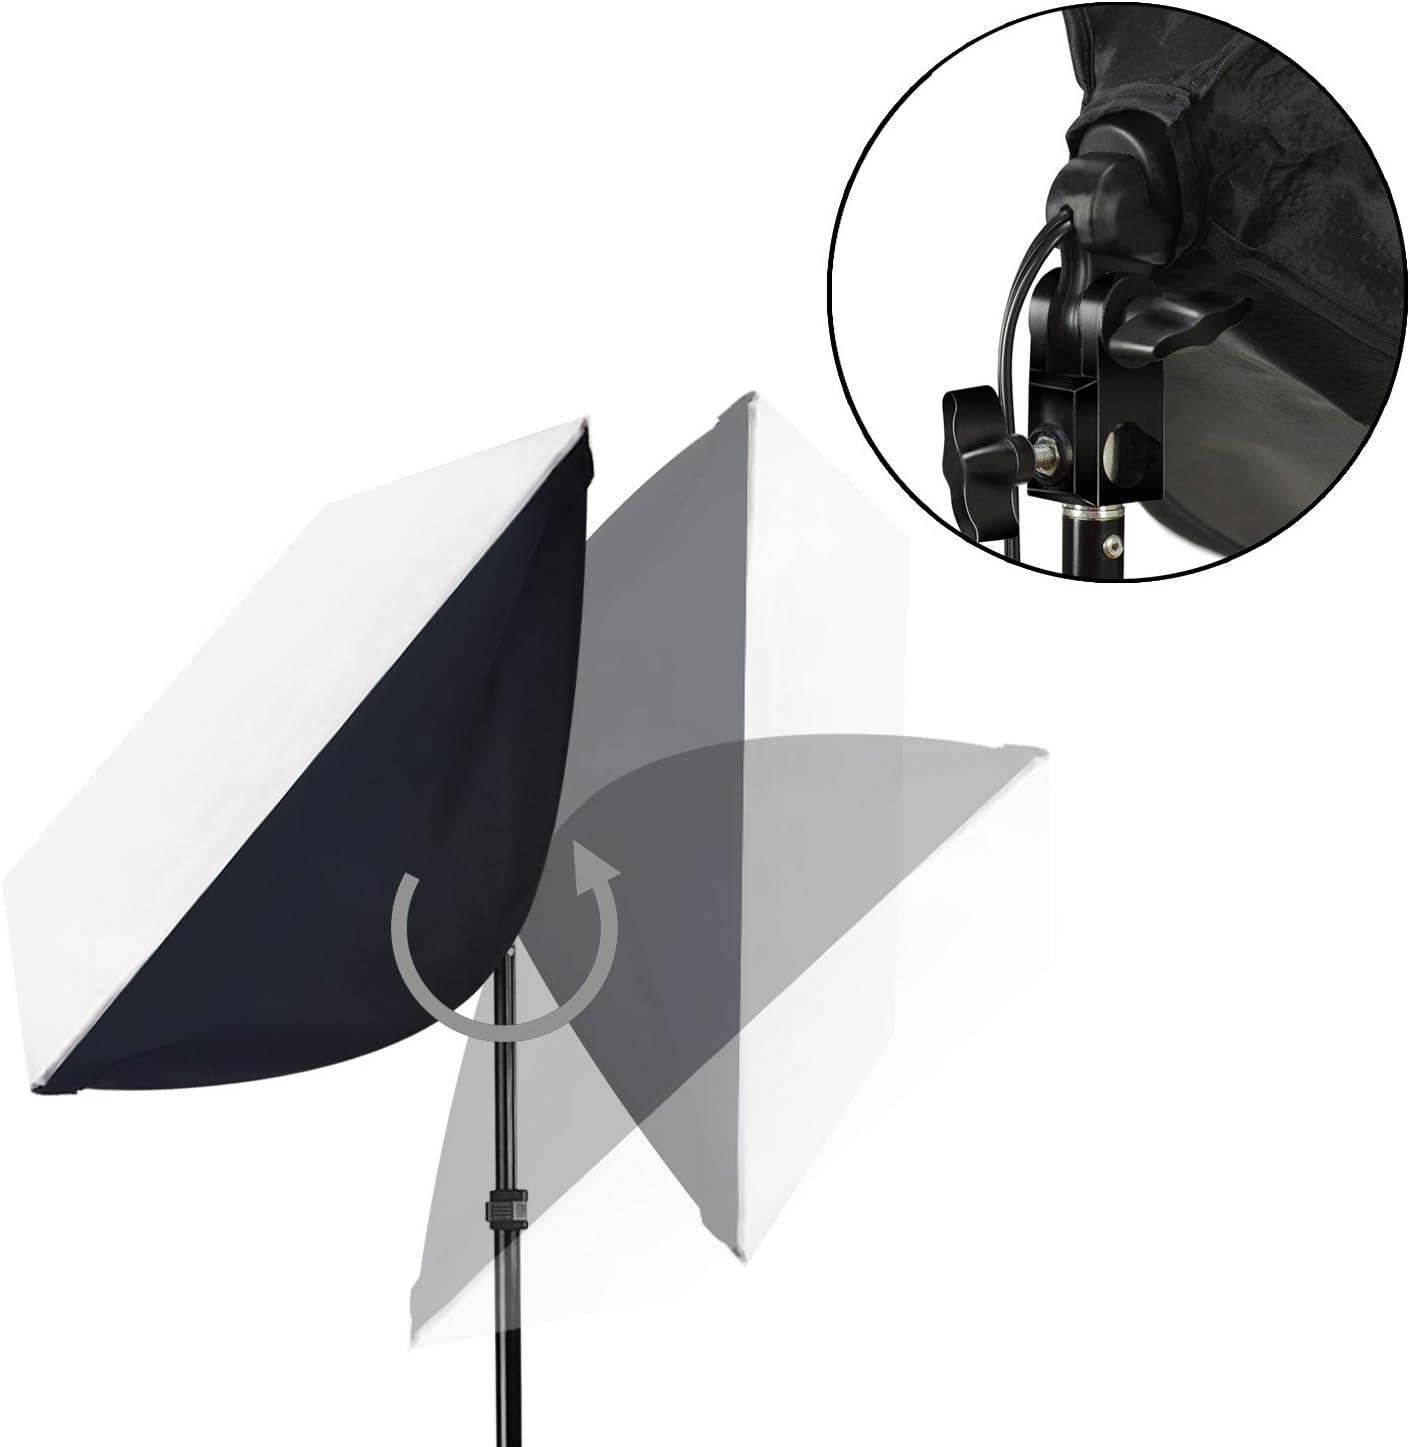 AGG2646 LimoStudio Photo Studio Lighting Kit Boom Arm Stand Set with Carry Bag Softbox Video Light